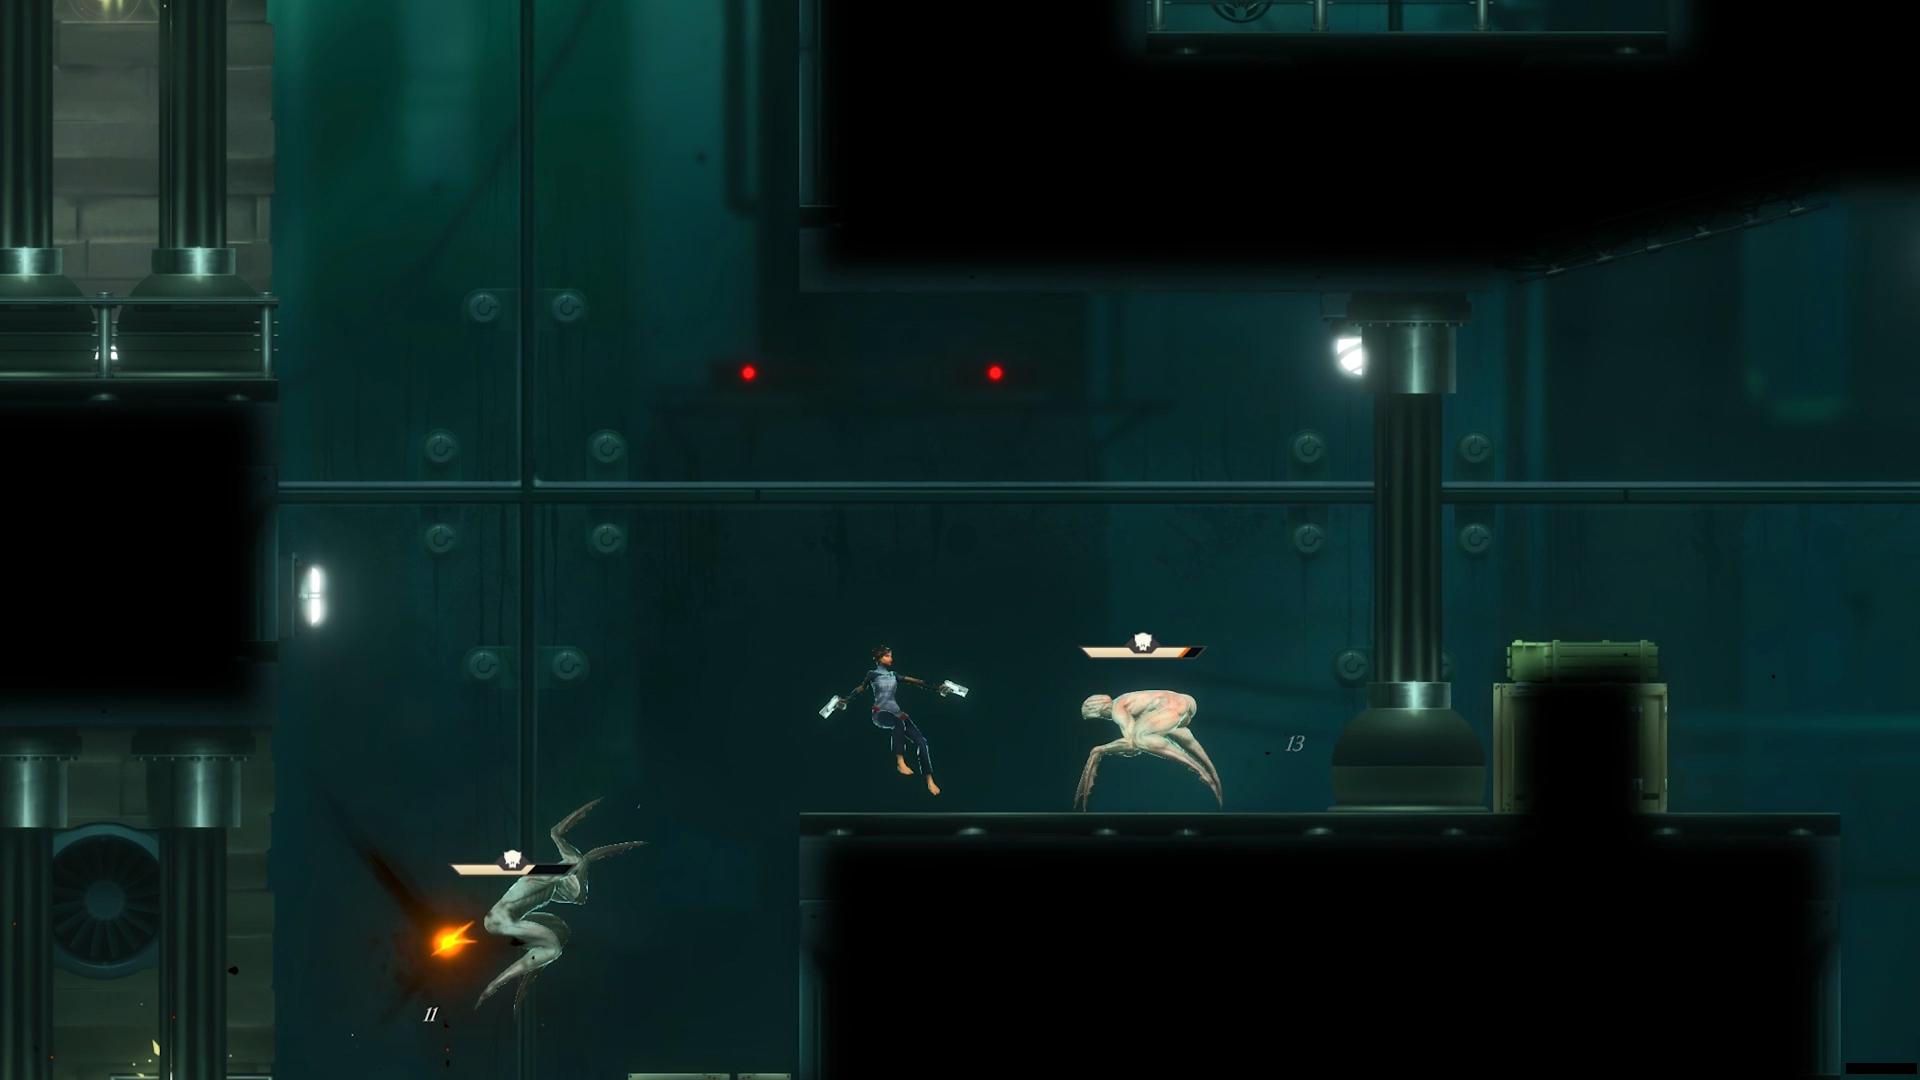 Seraph Screenshot 2